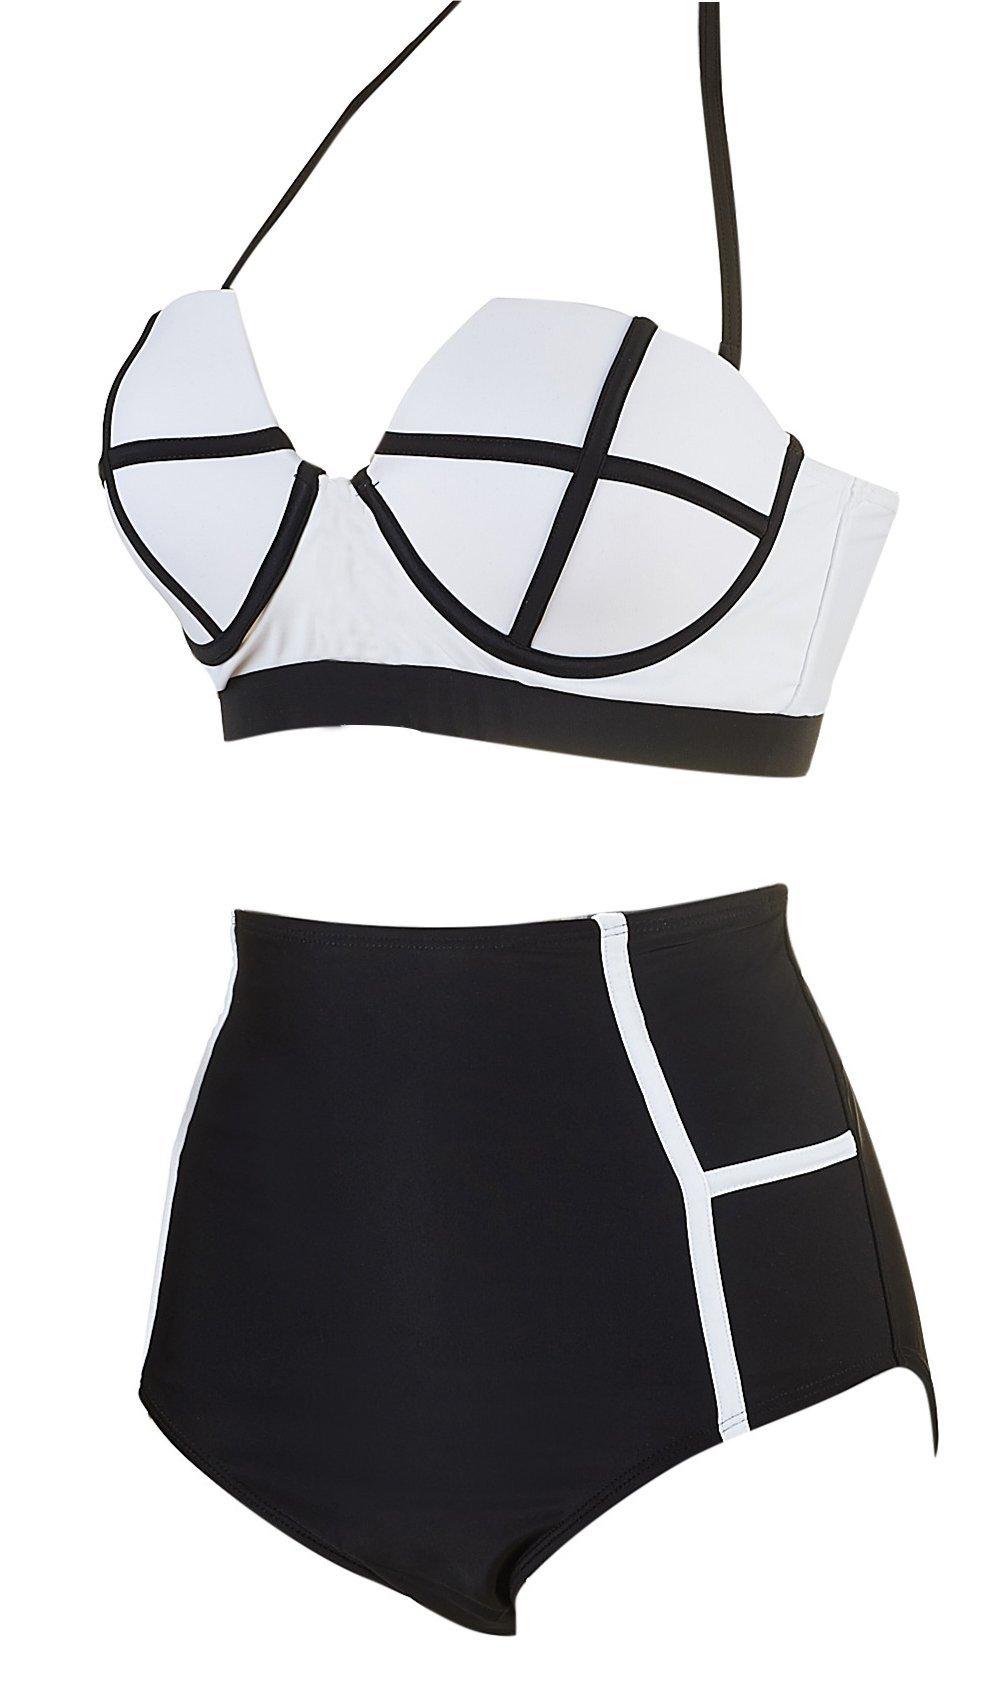 LA PLAGE Women's Colorful High Waist Padded Bathing Suit Size US XX-Large White by LA PLAGE (Image #2)